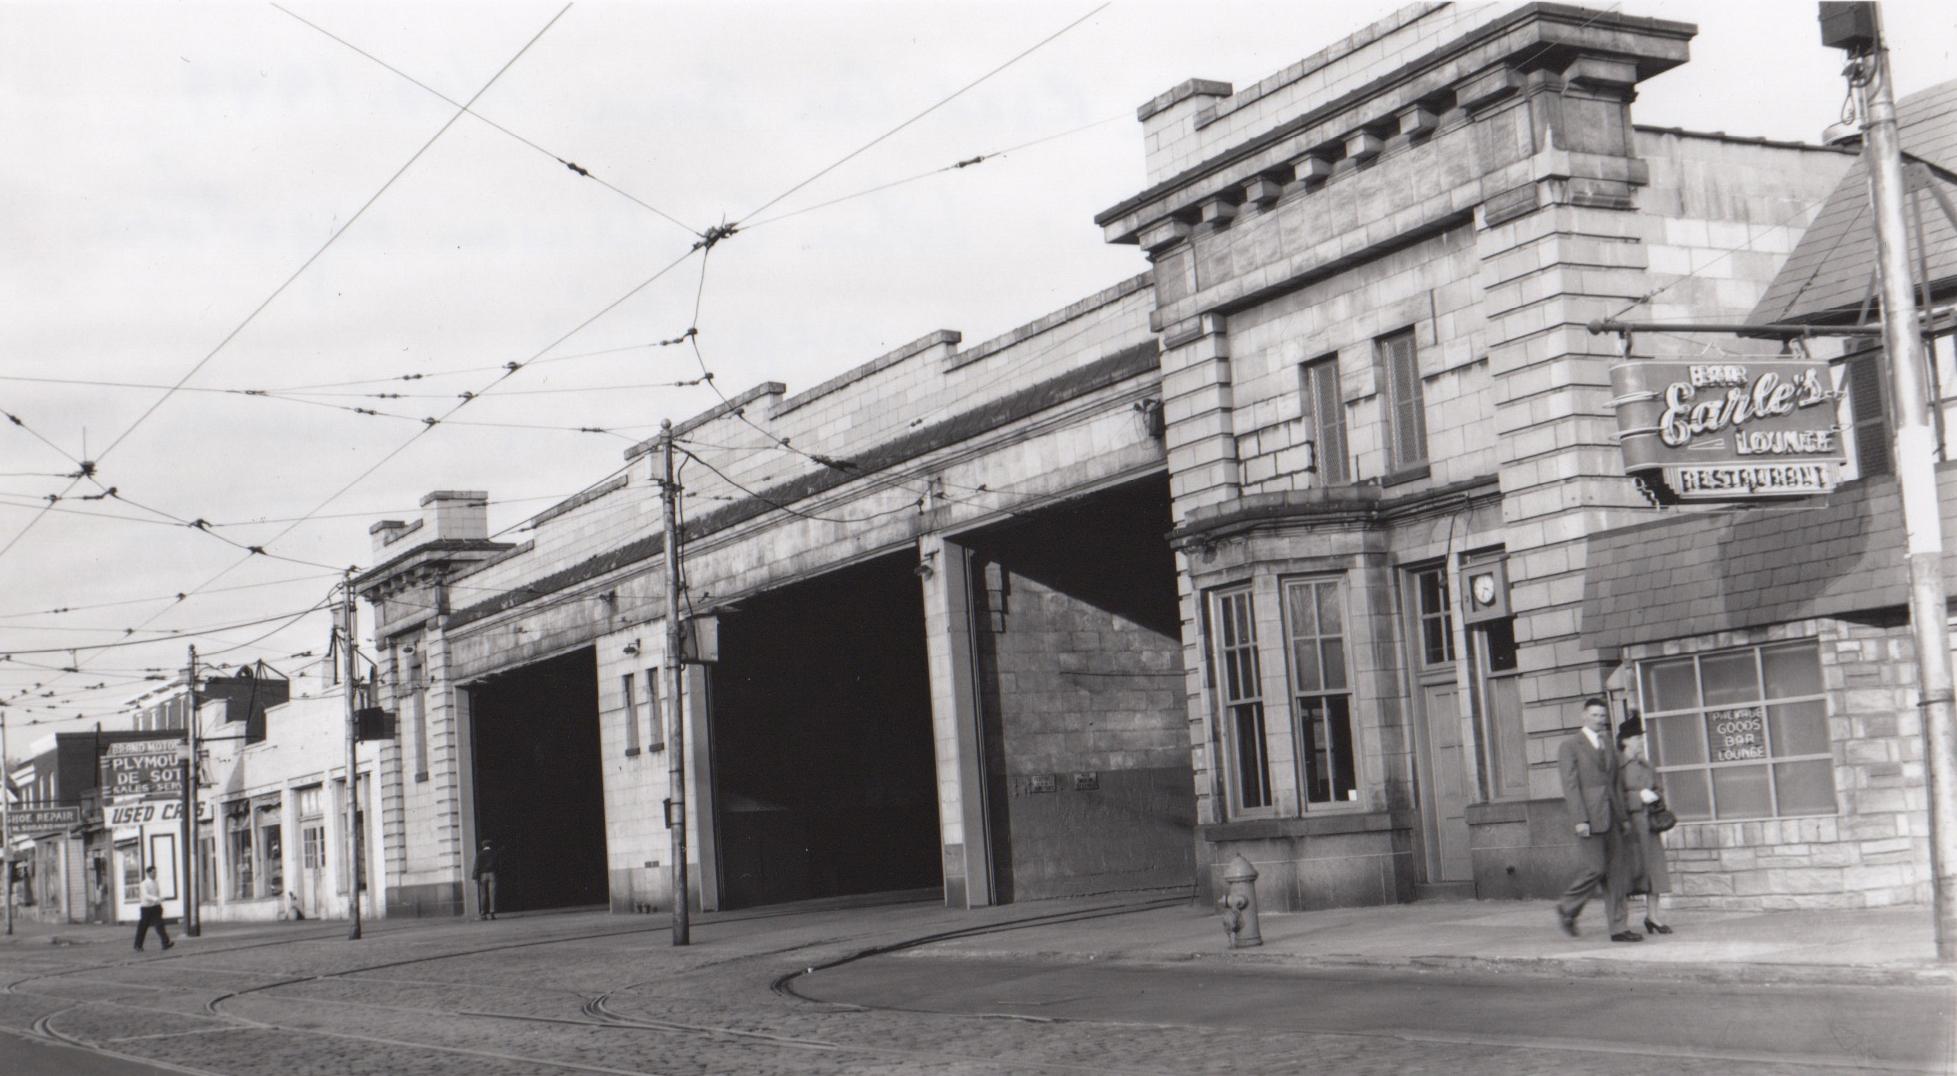 Image Credit: Davis Engleman, York Road Car House, Nov 1949